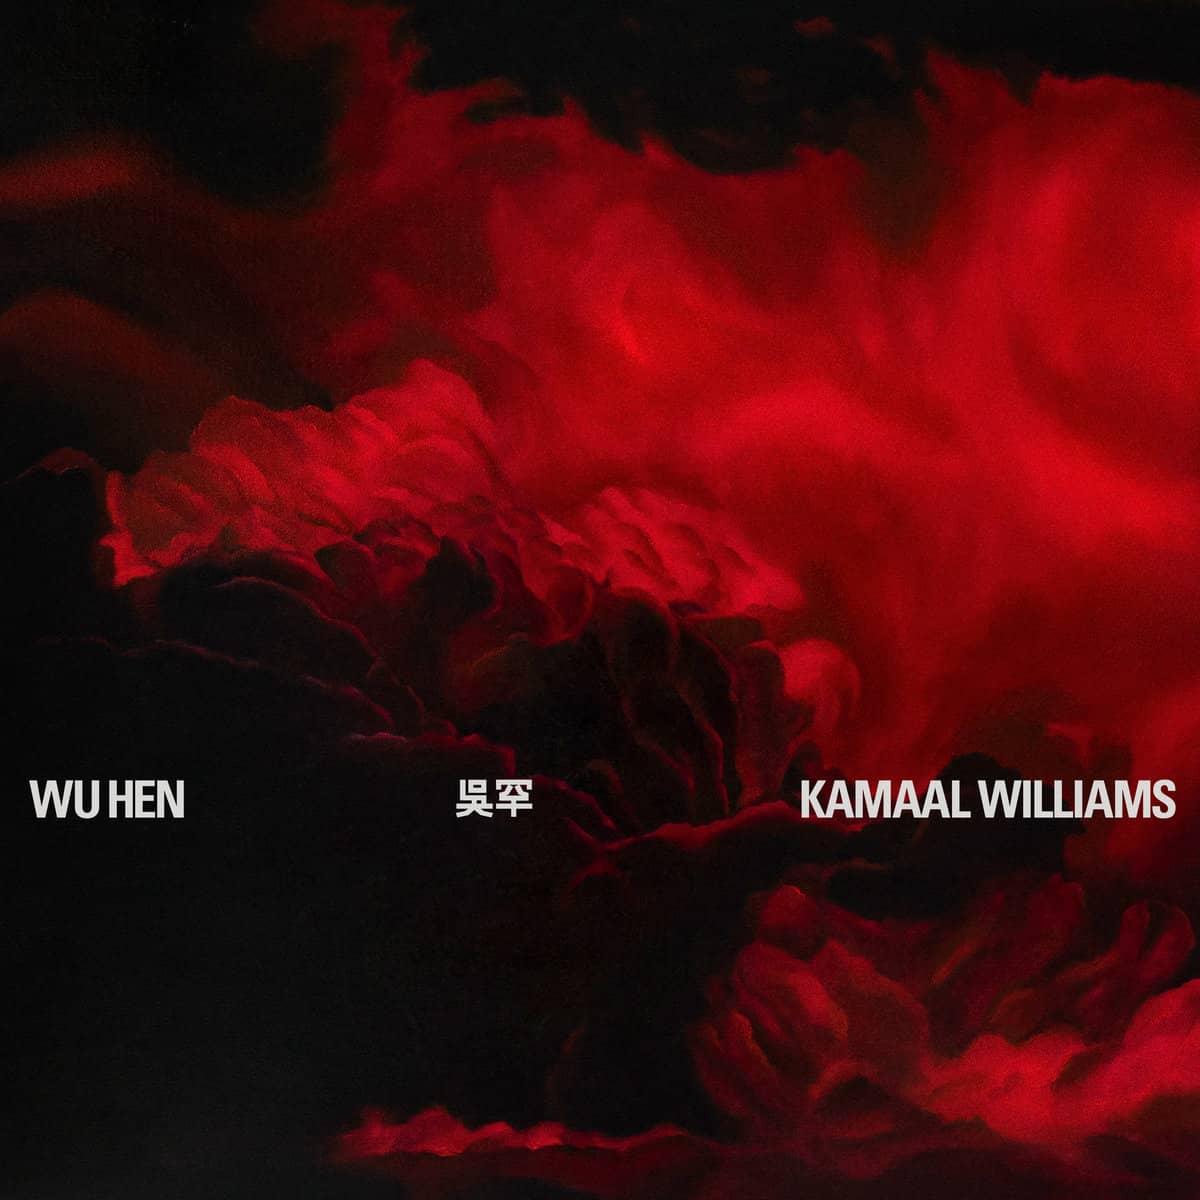 Wu Hen – Album by Kamaal Williams